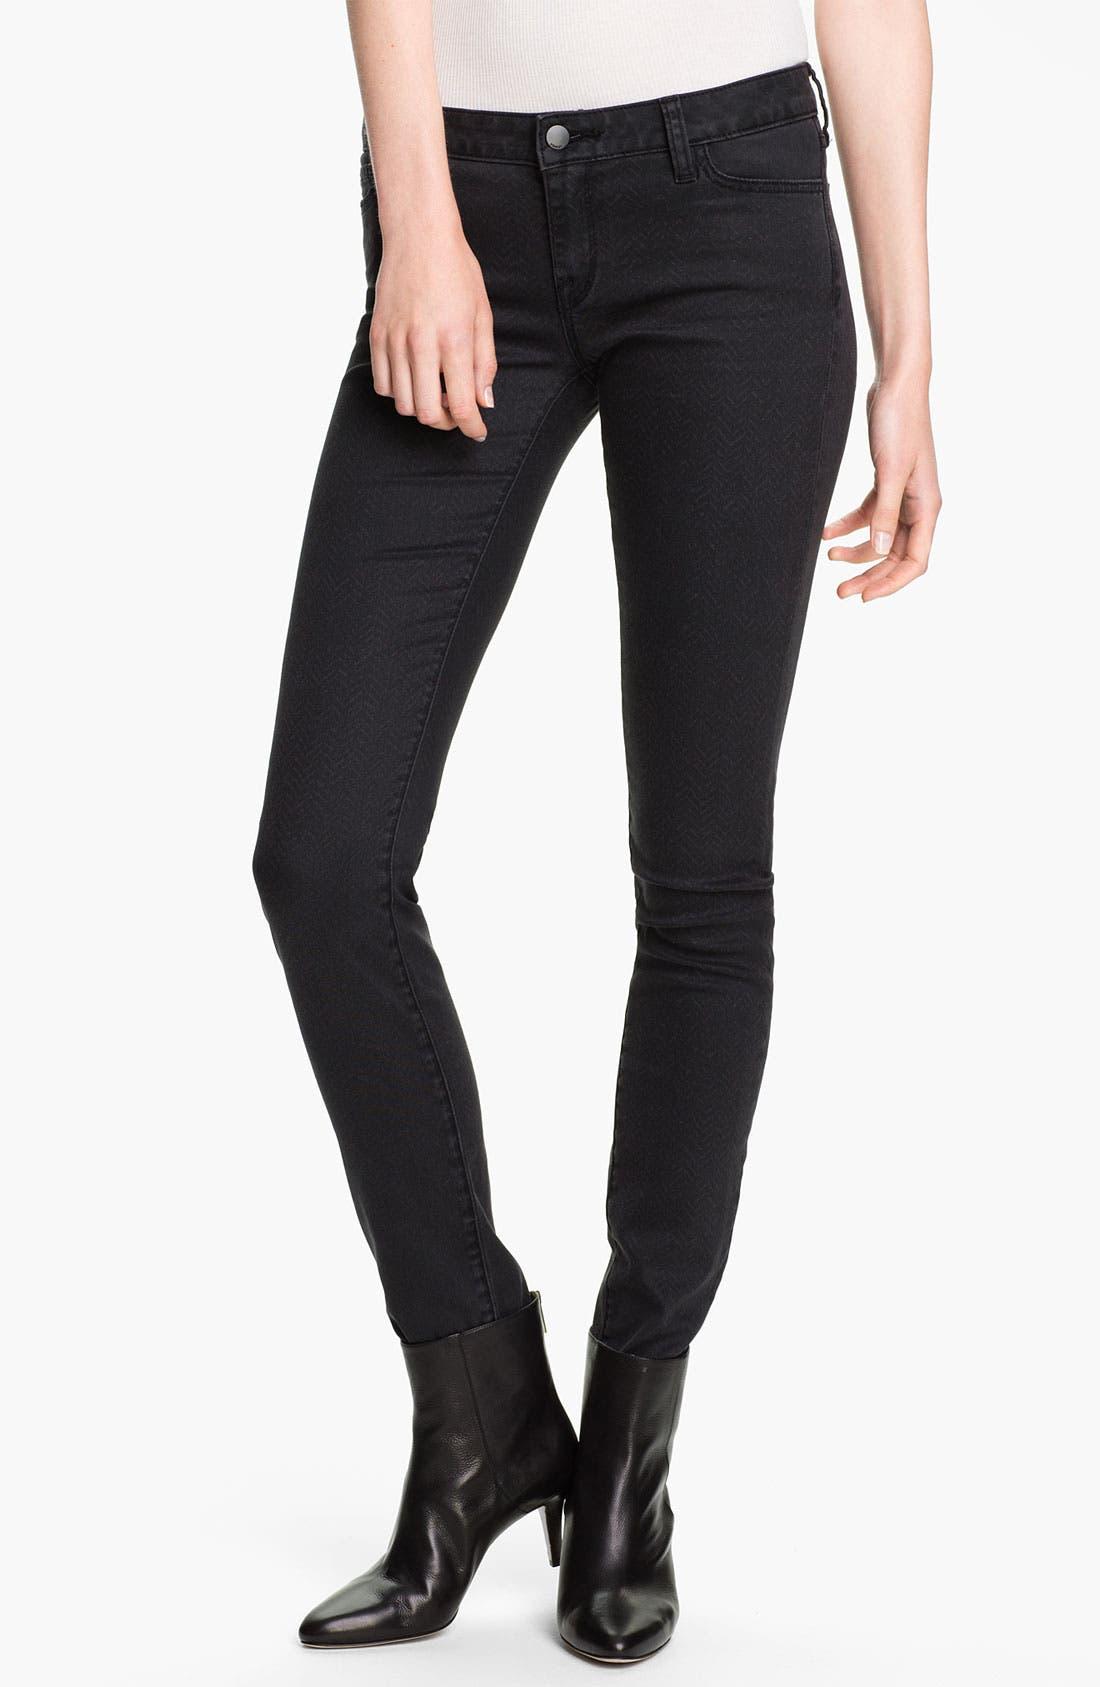 Alternate Image 1 Selected - Vince Print Stretch Skinny Jeans (Charcoal Herringbone)